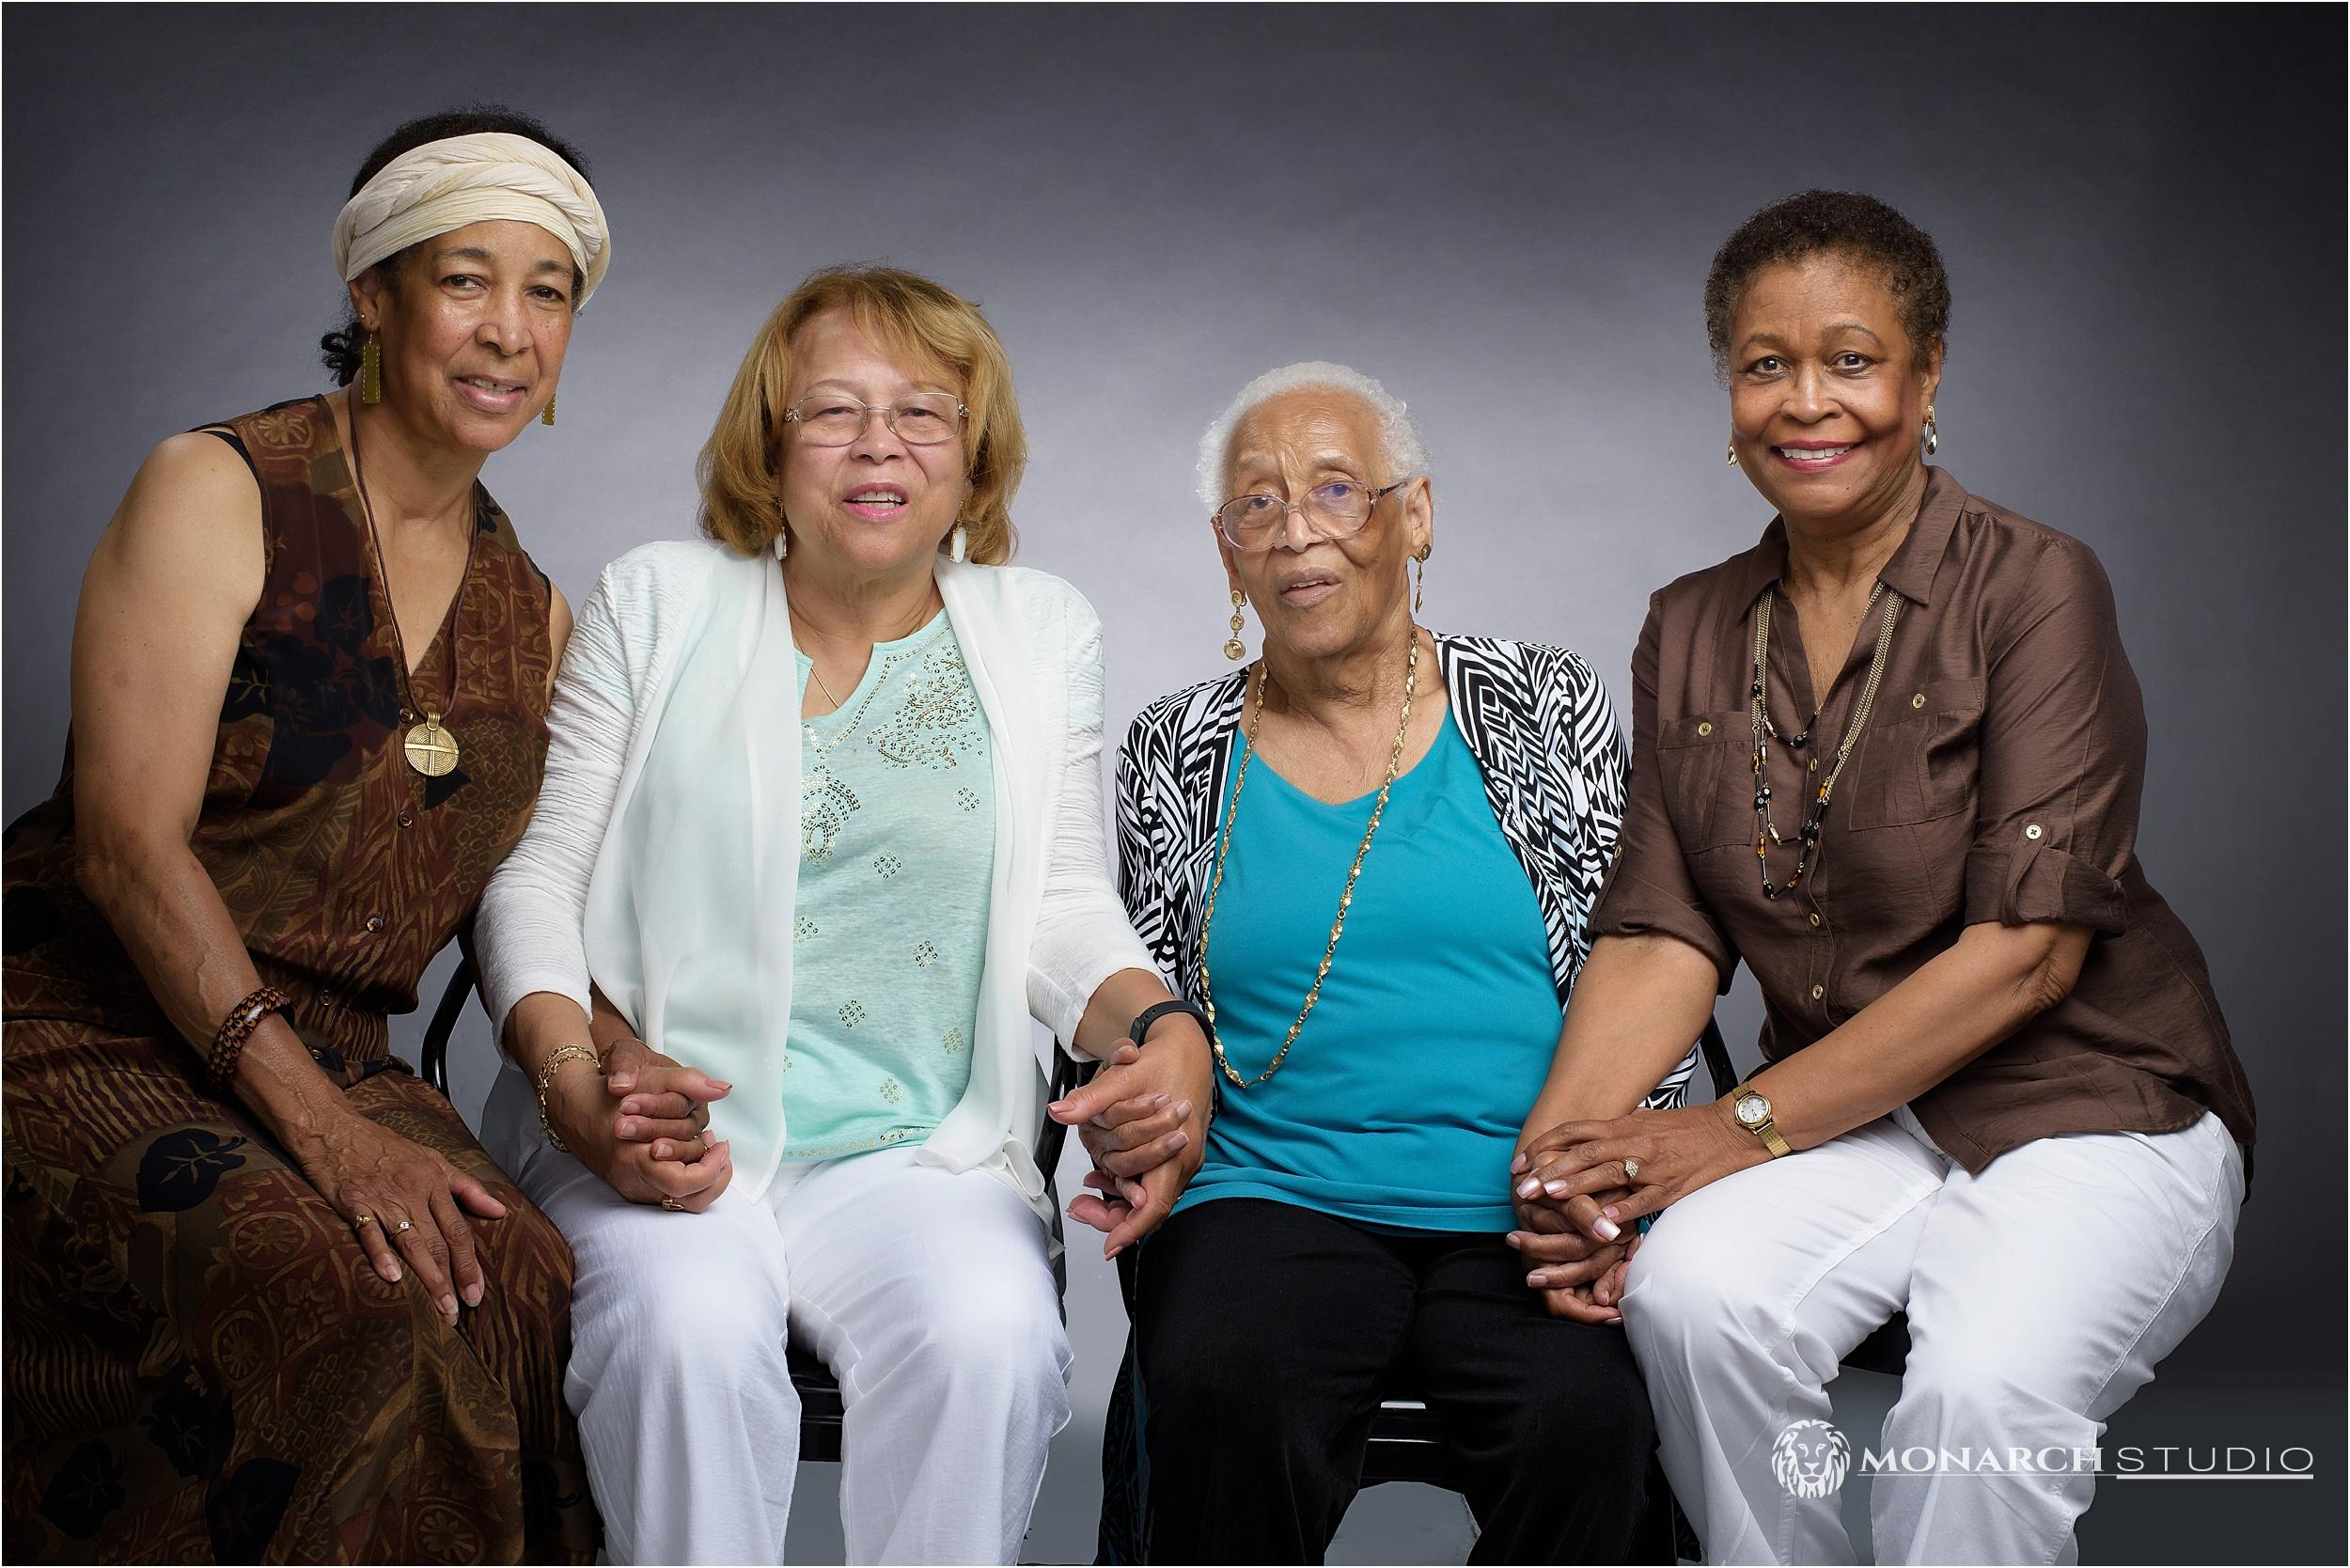 st-augustine-photographer-family-reunion-portrait-011.jpg